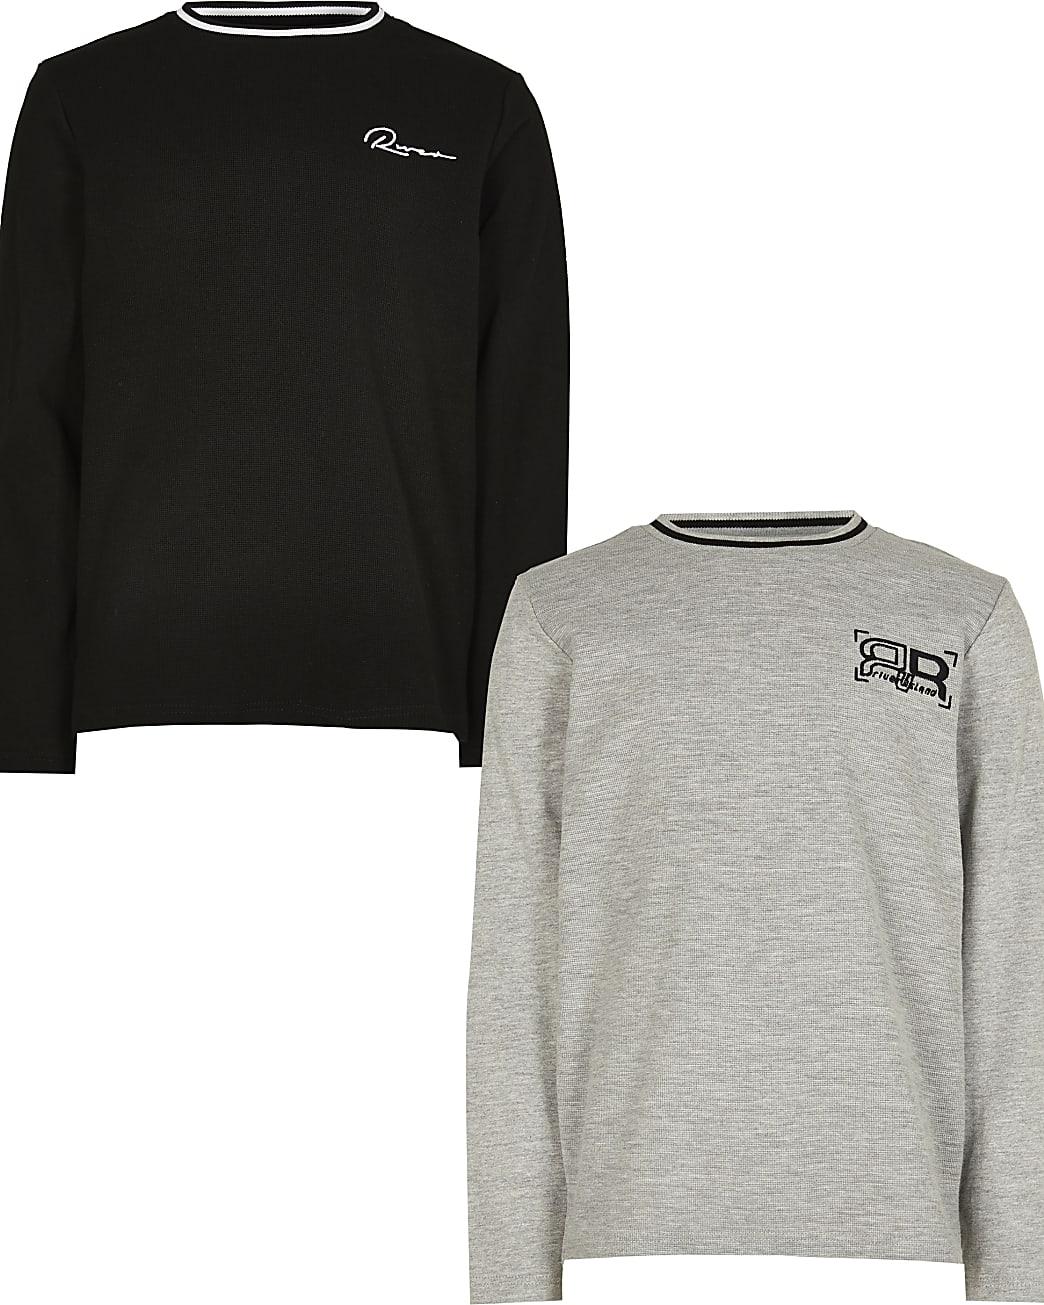 Boys grey waffle long sleeve tops 2 pack